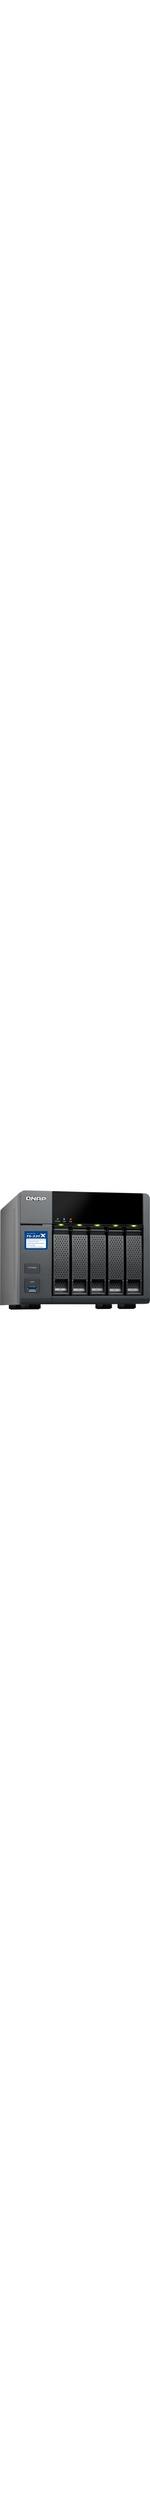 QNAP Turbo NAS TS-531X 5 x Total Bays SAN/NAS Storage System - Tower - ARM AL-314 Quad-core